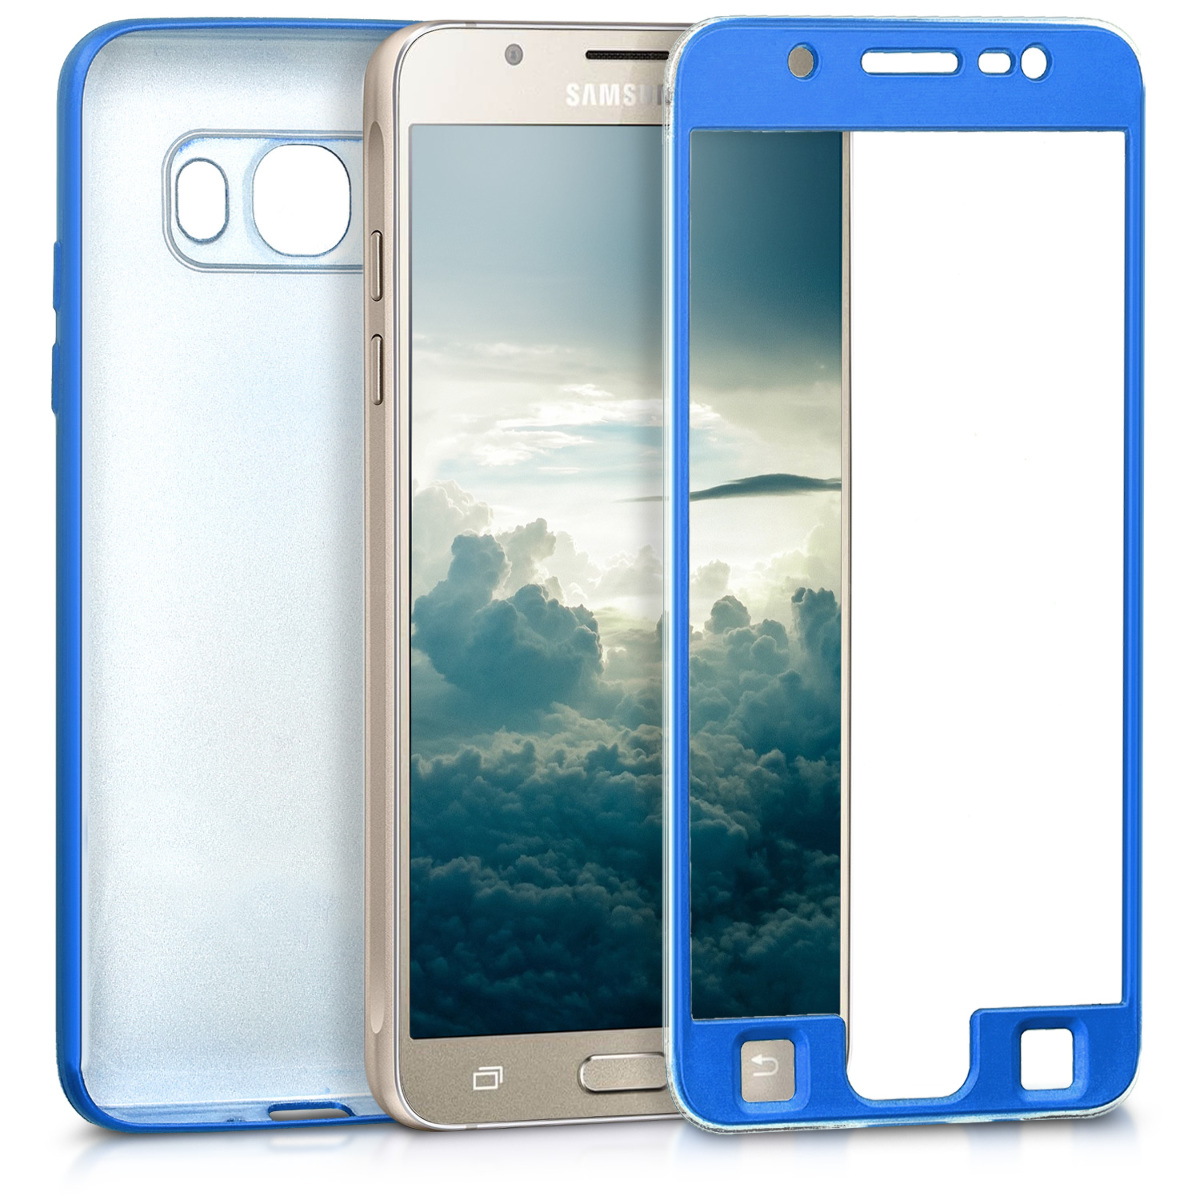 KW Θήκη Σιλικόνης Full Body Samsung Galaxy J5 (2016) DUOS - Metallic Blue (41806.64)